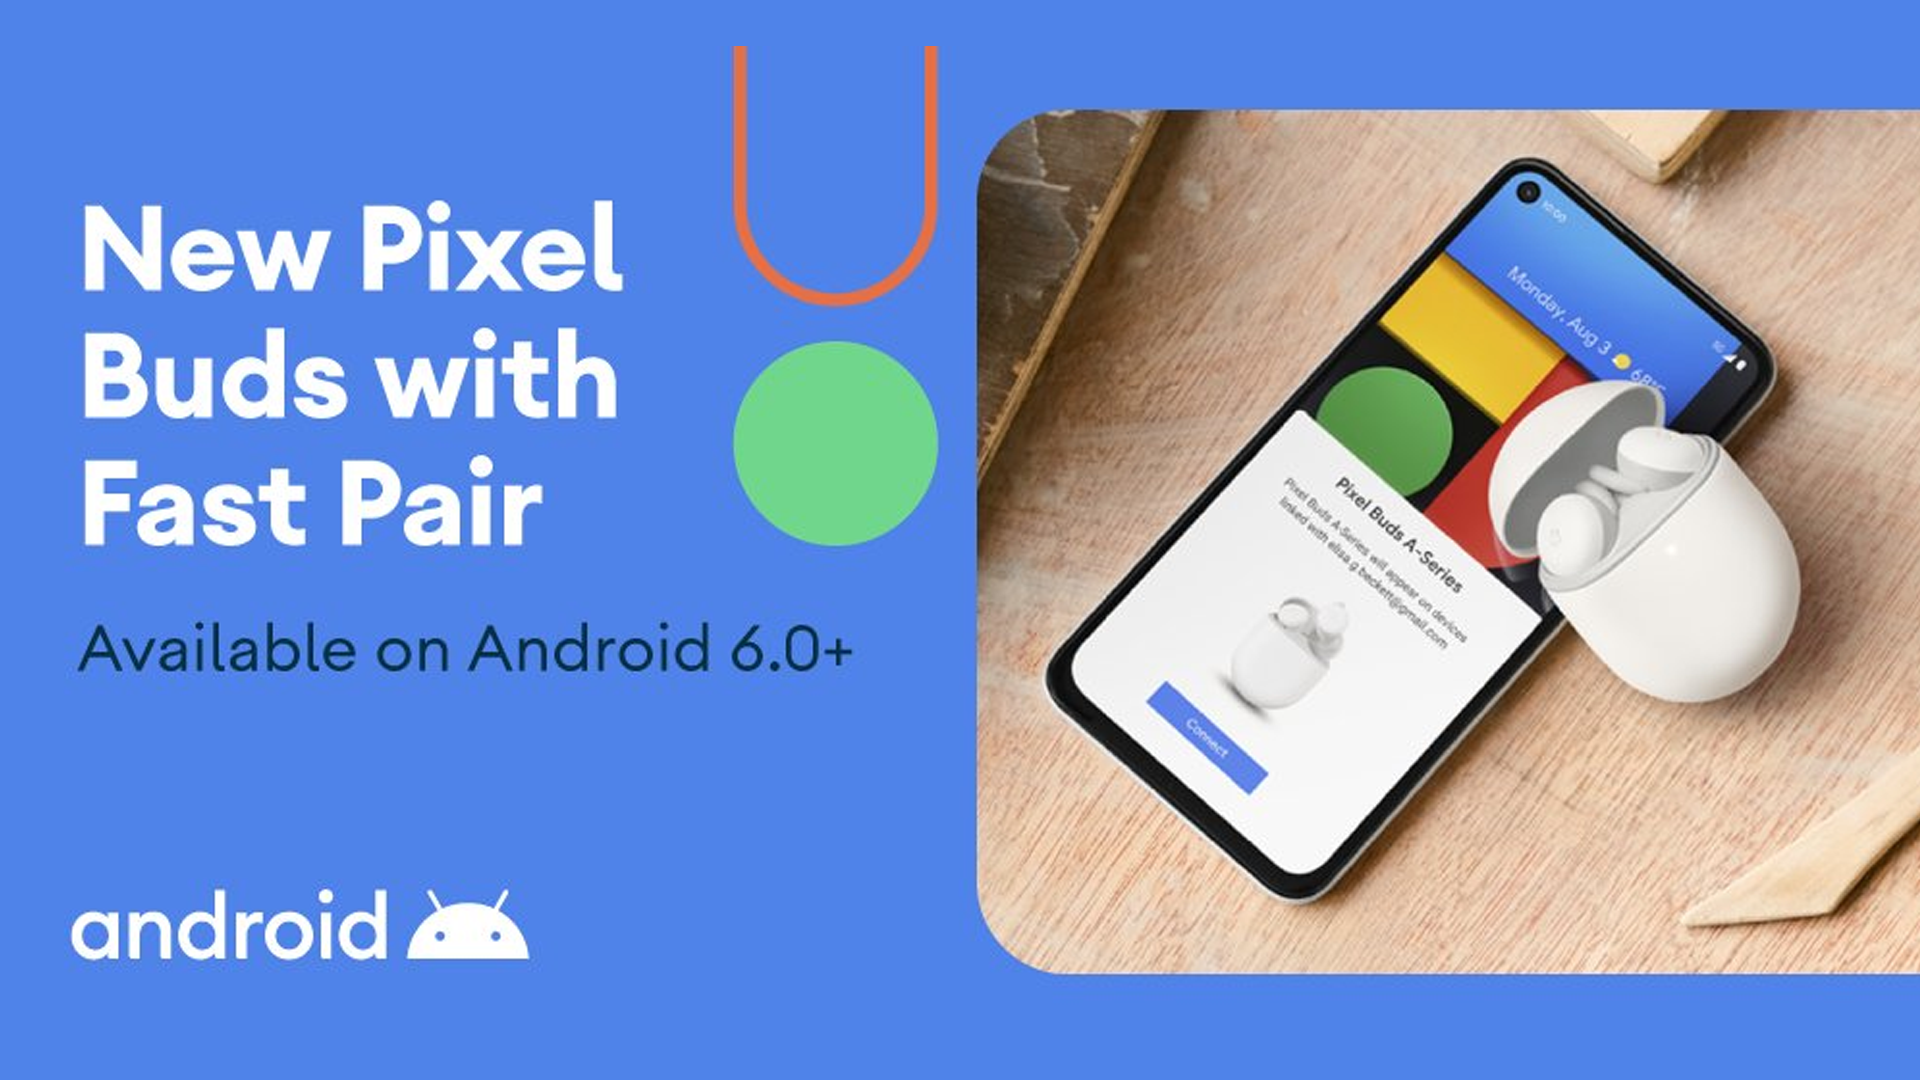 Google Pixel Buds A-Series quick pair